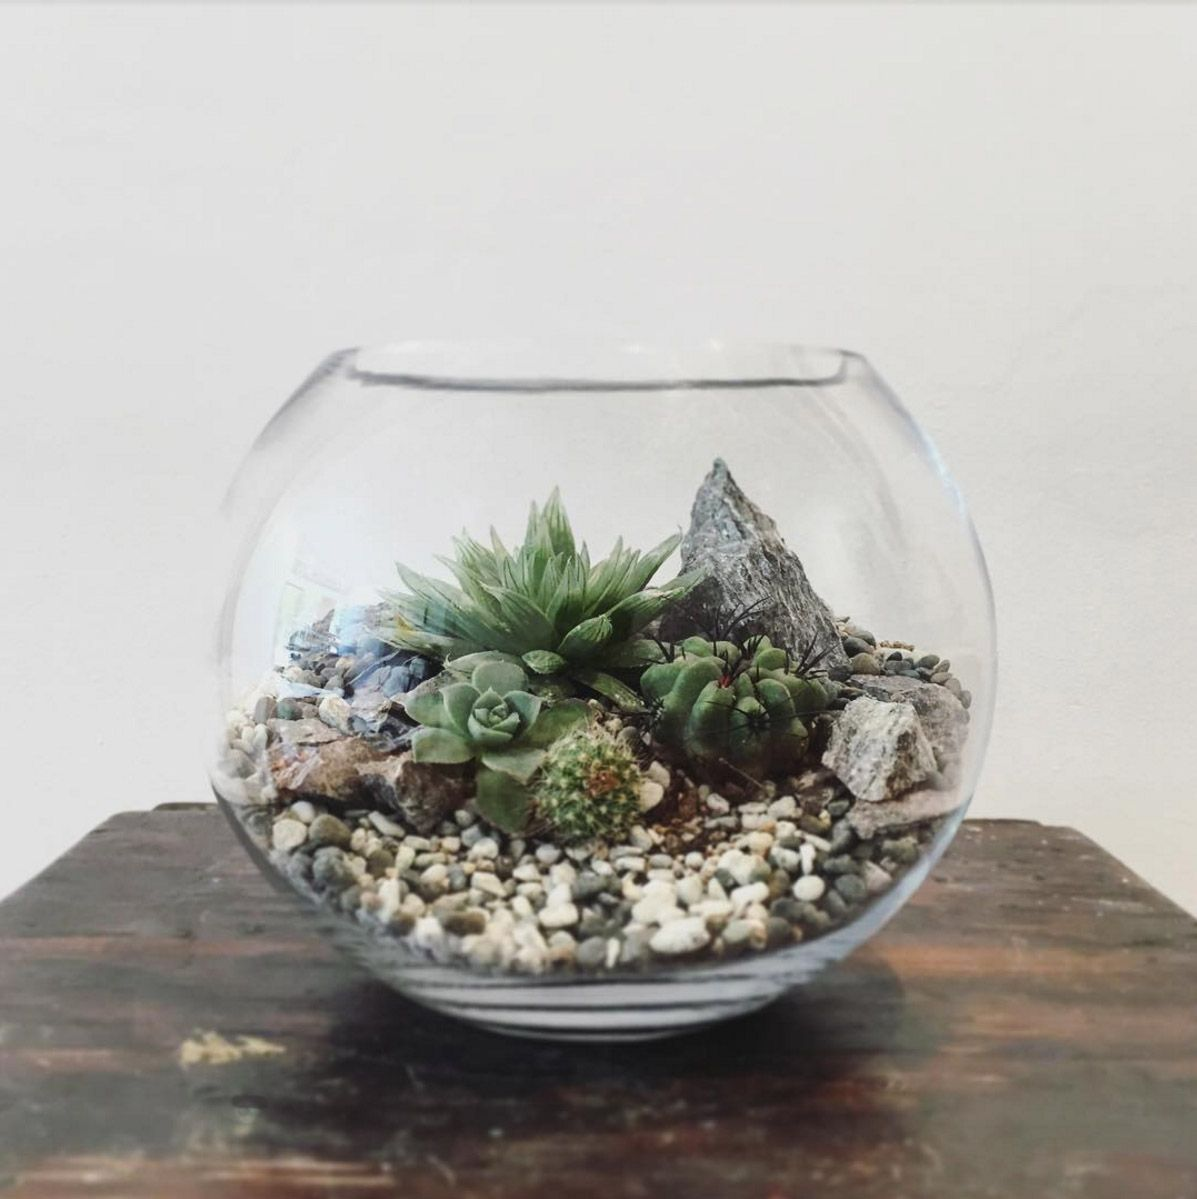 desert world terrarium small terraria cacti and deserts. Black Bedroom Furniture Sets. Home Design Ideas